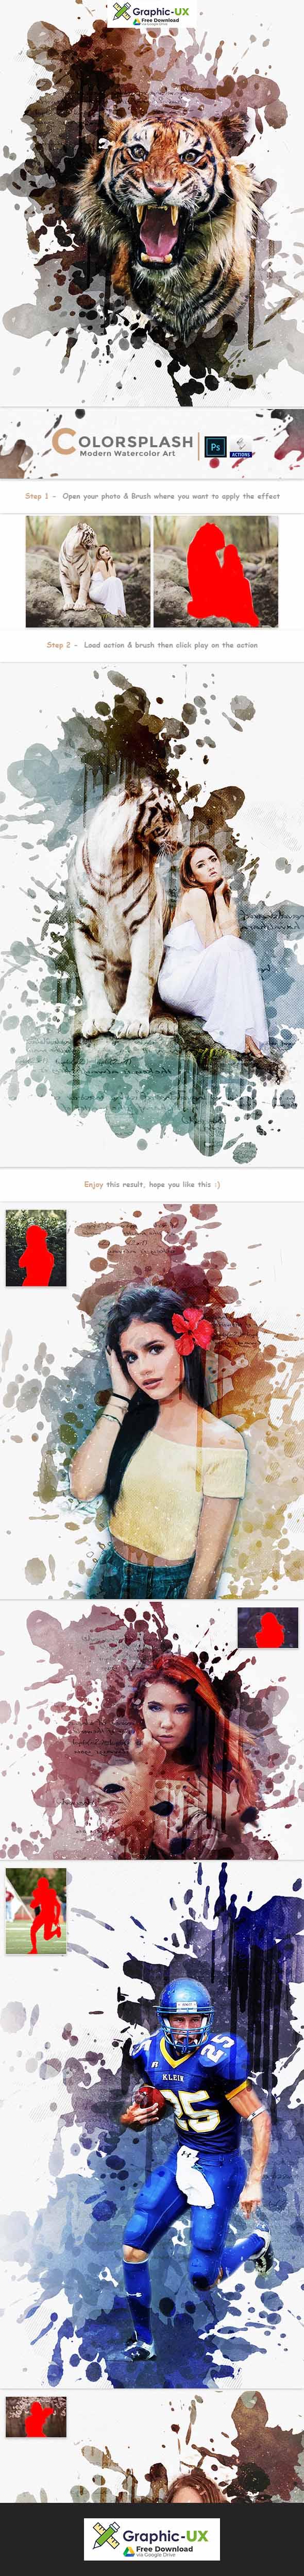 Colorsplash - Modern Watercolor Art | PS Action